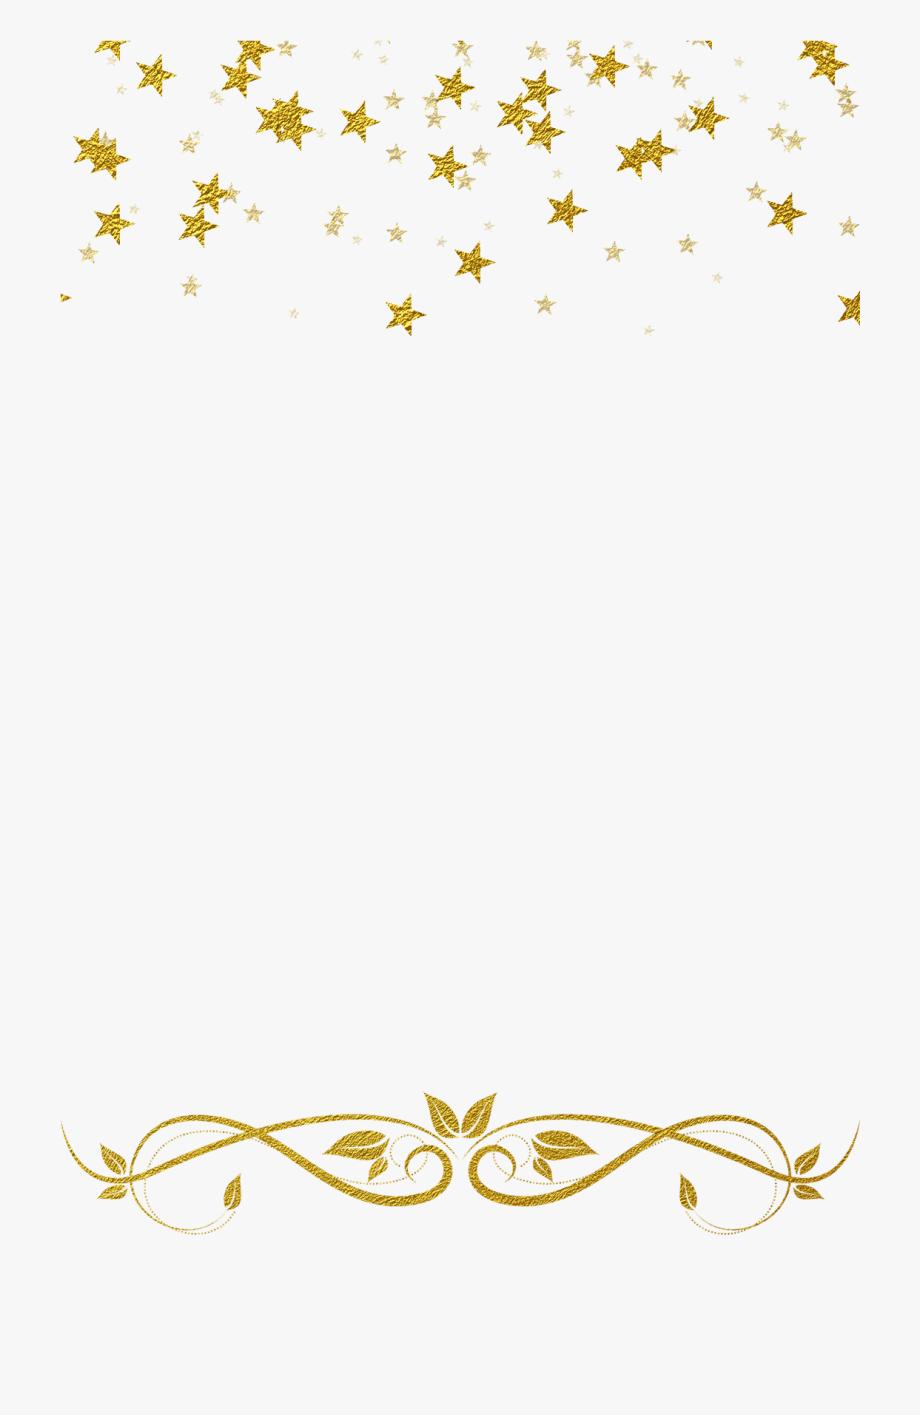 Snapchat star cliparts clip art black and white Gold Star Snapchat Clip Art - Transparent Rose Gold ... clip art black and white